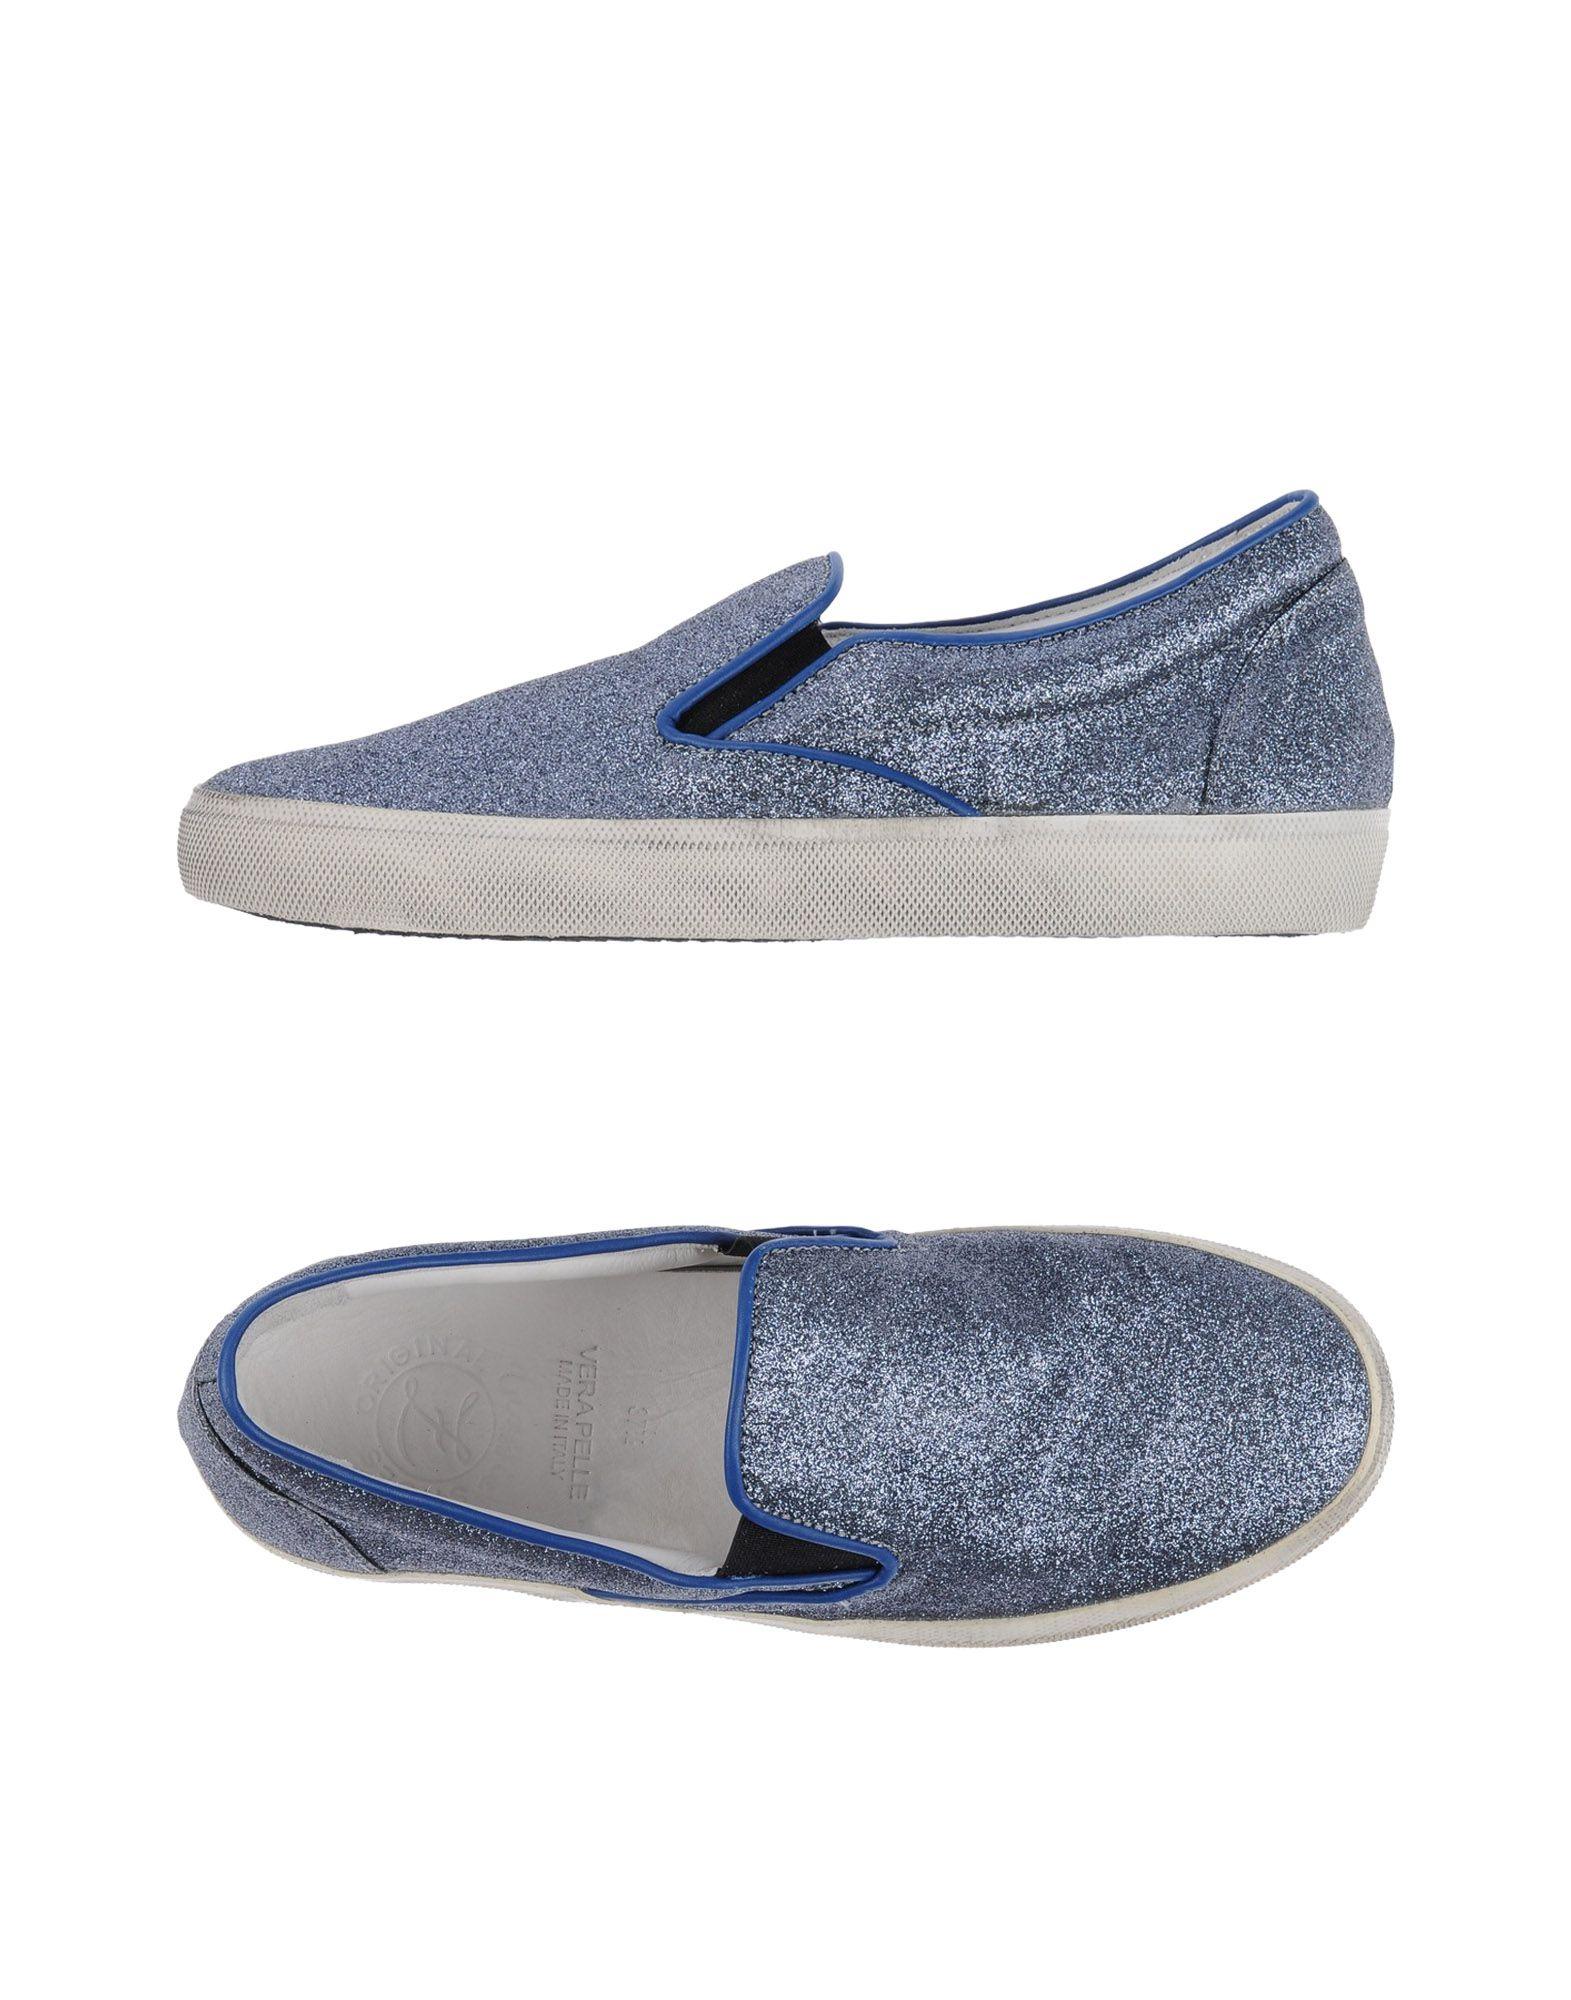 TRAFFIC ORIGINAL SHOES Низкие кеды и кроссовки keyconcept france original feiyue shoes classical kungfu shoes taiji shoes popular